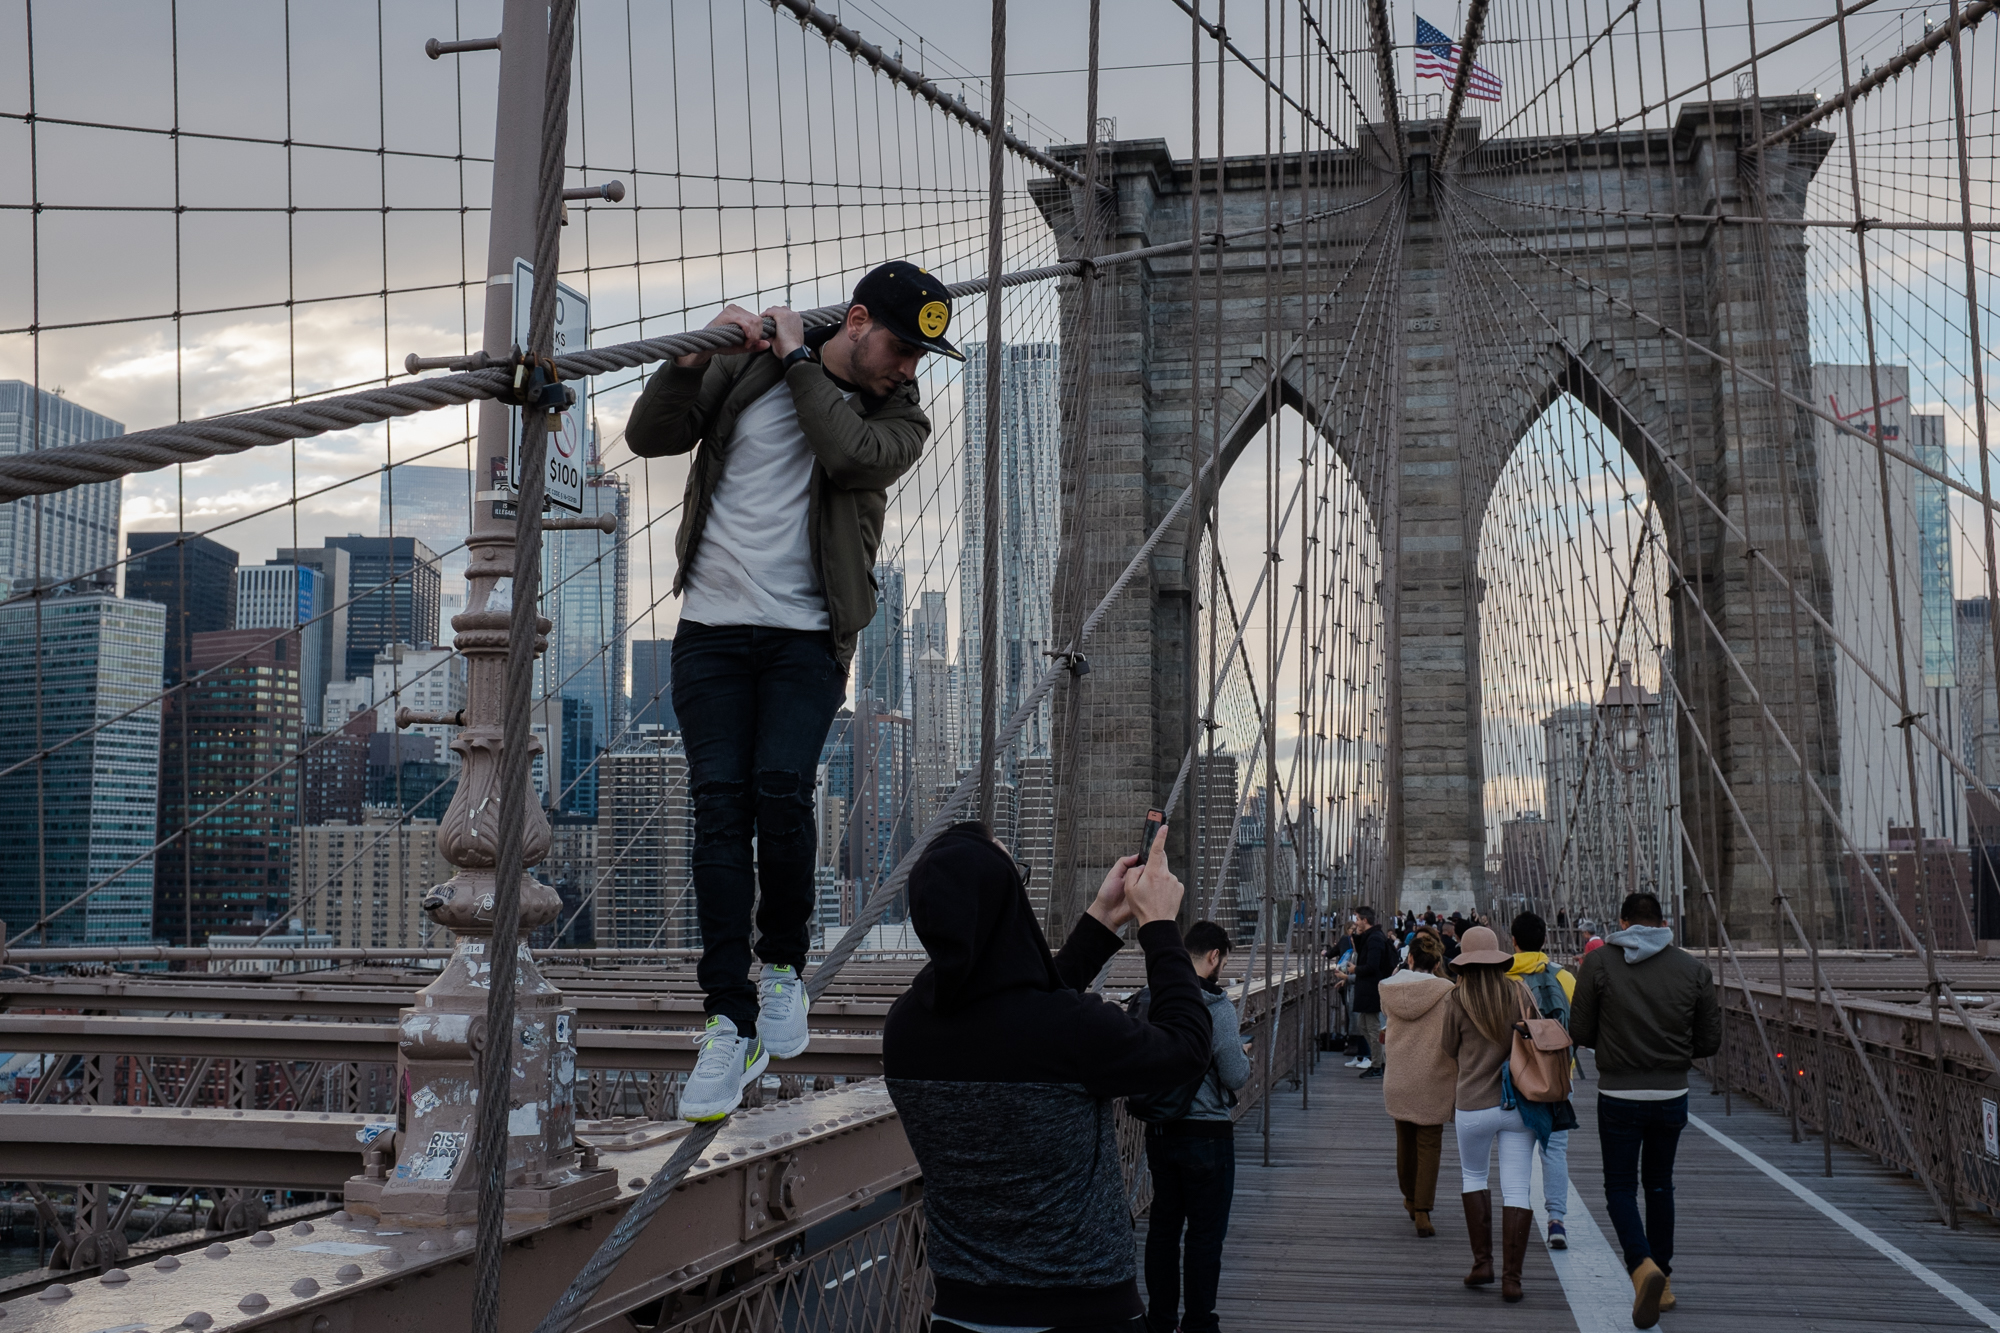 Did you get the photo? Brooklyn Bridge.